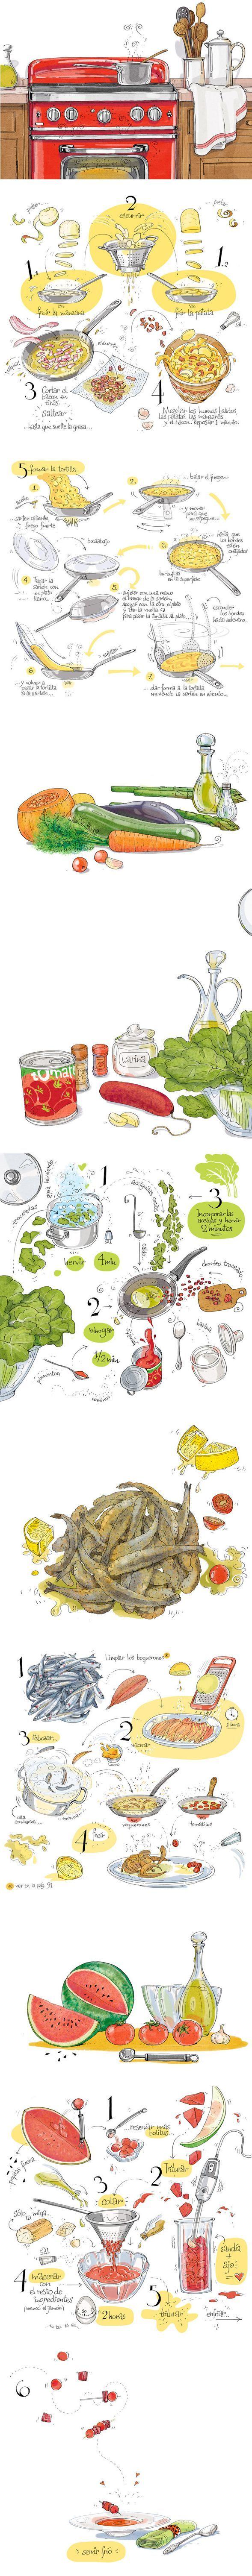 The Drawn Recipes Cookbook: